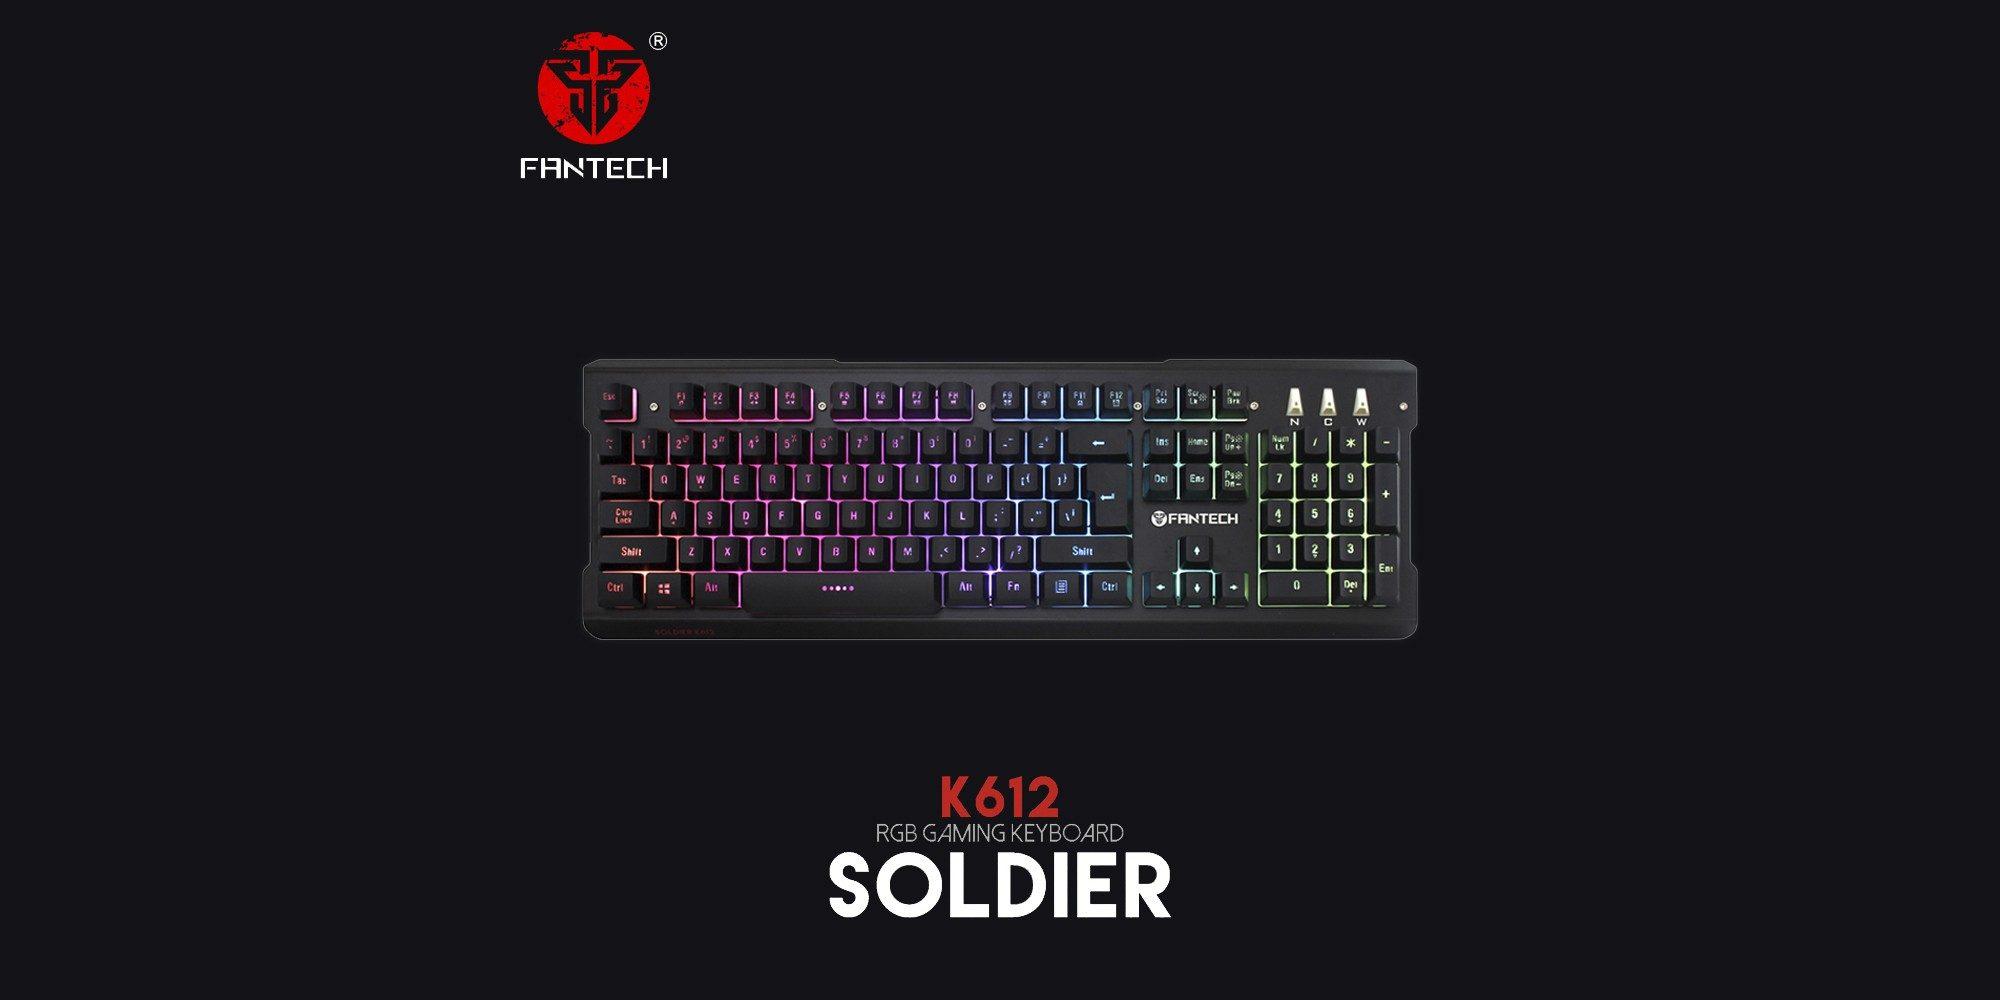 Клавиатура Fantech Soldier K612